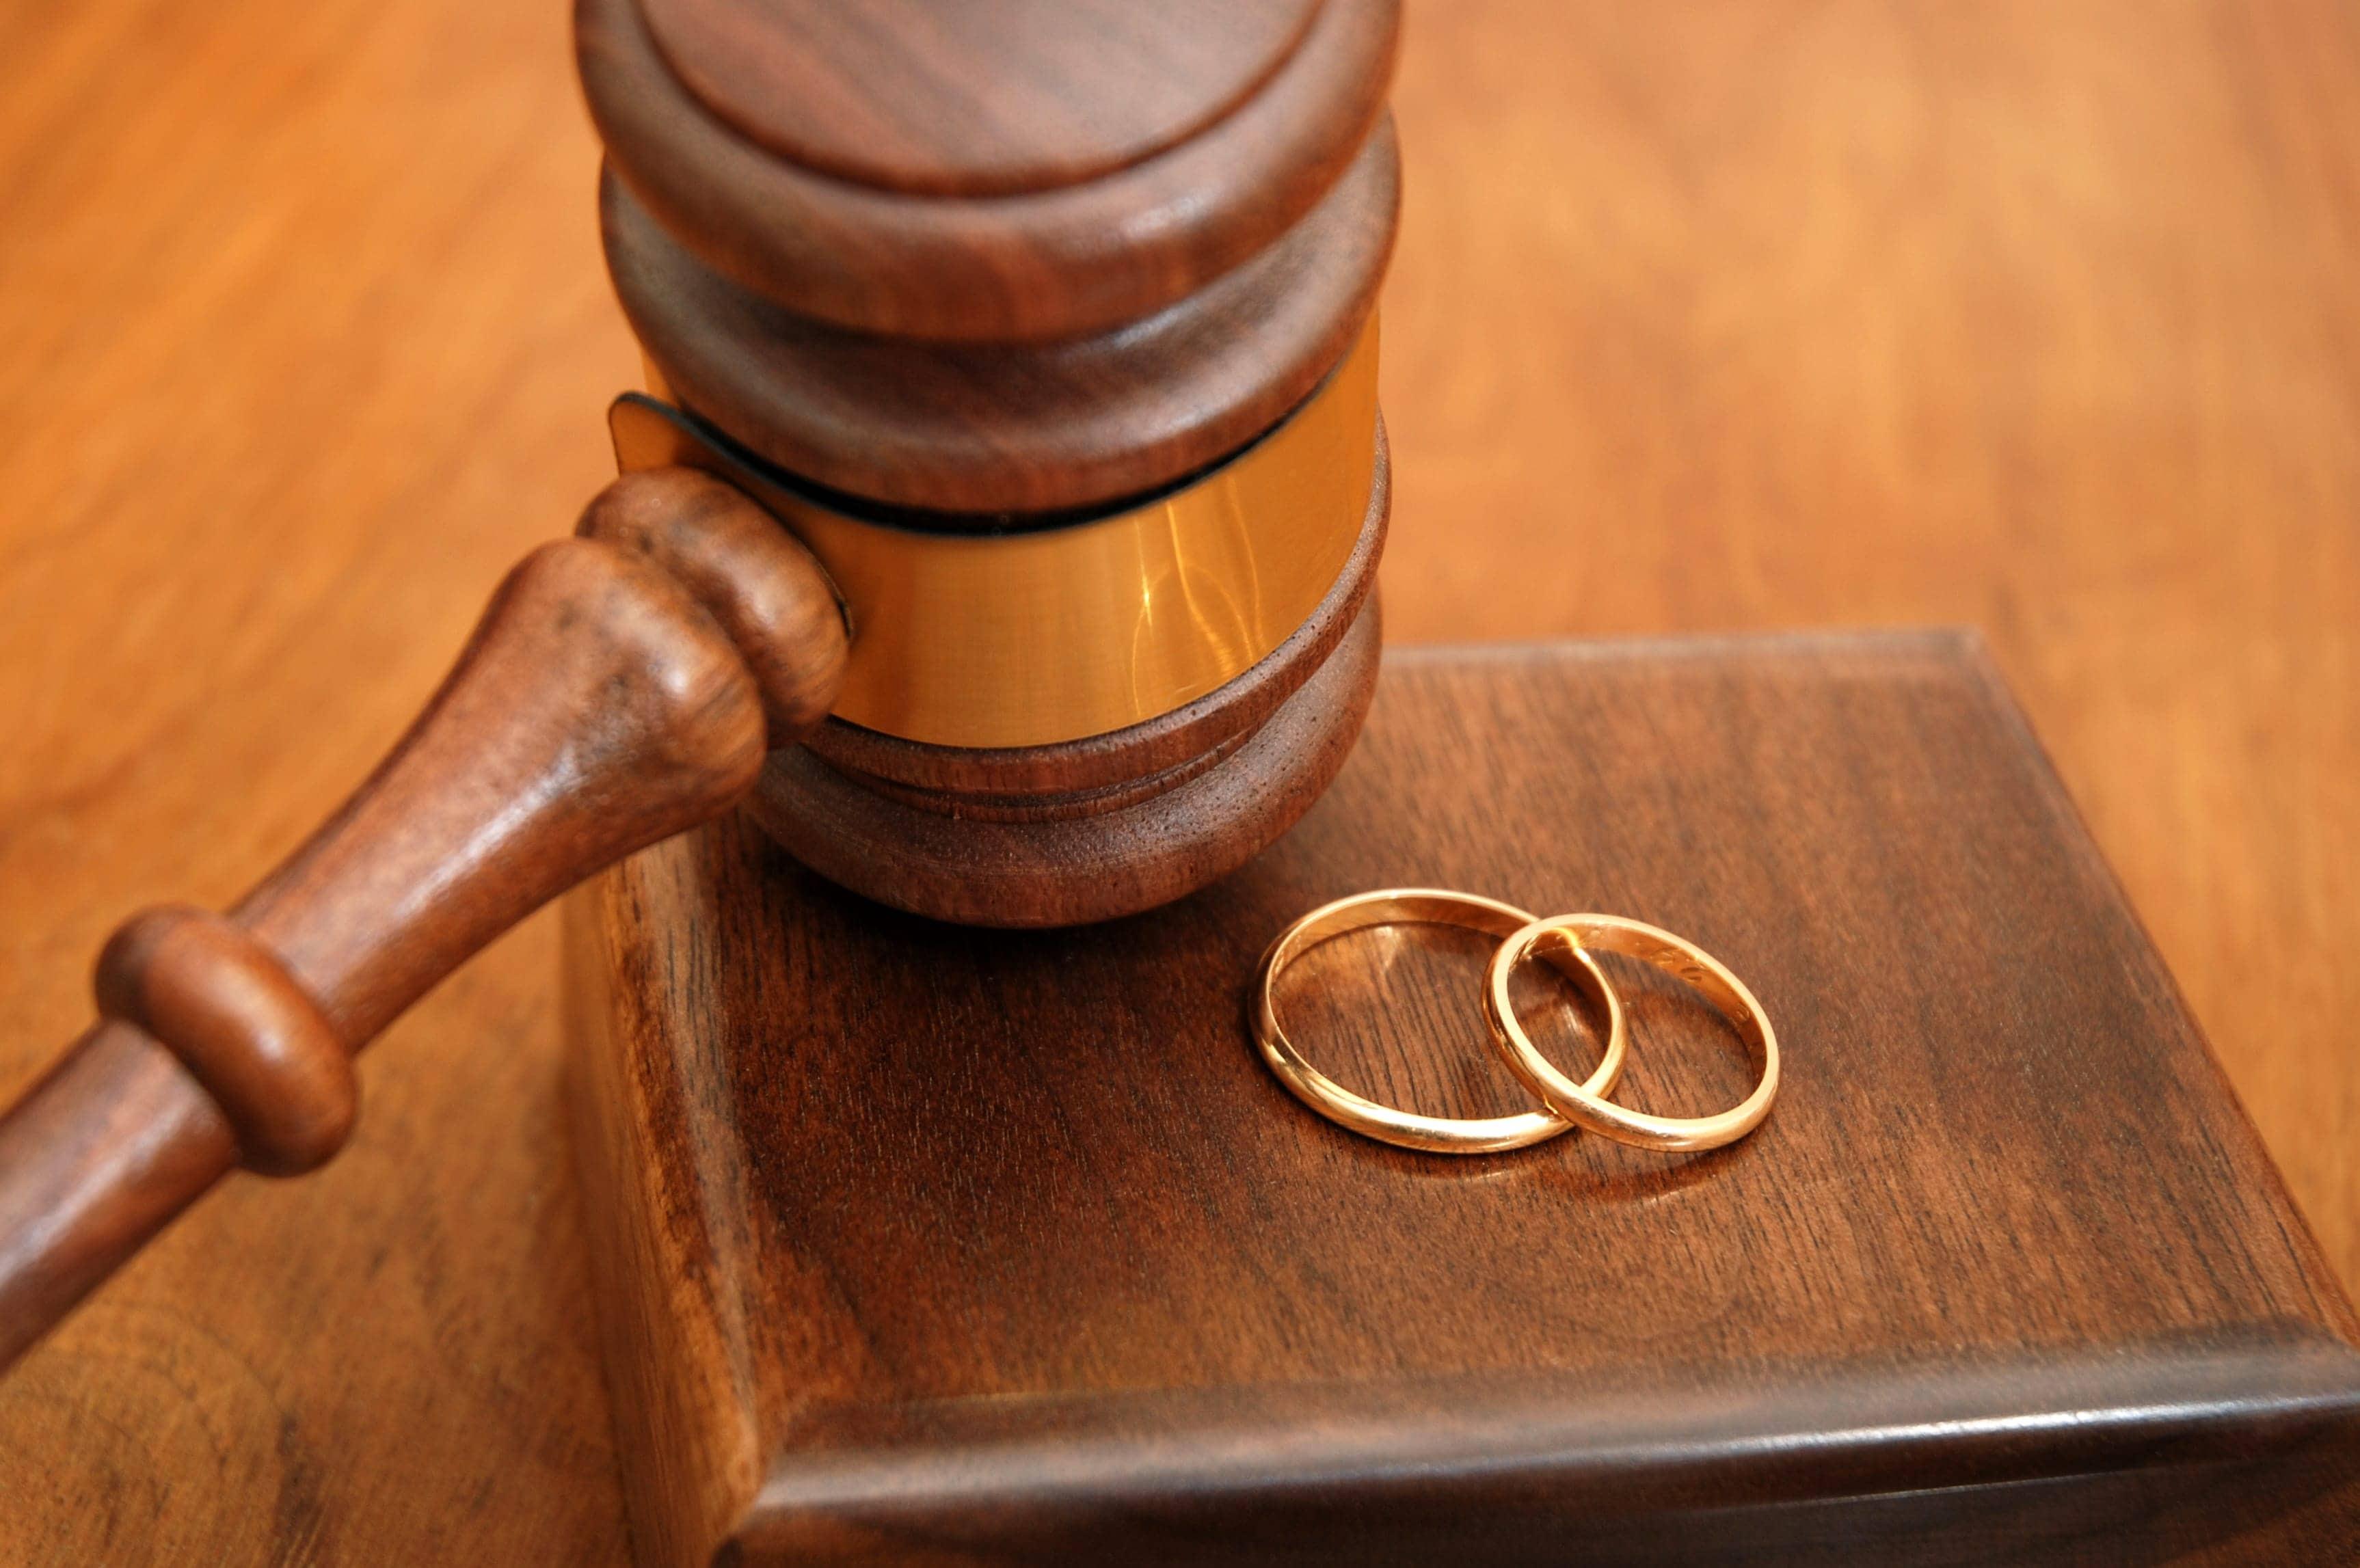 Женское сердце переносит развод тяжелее мужского